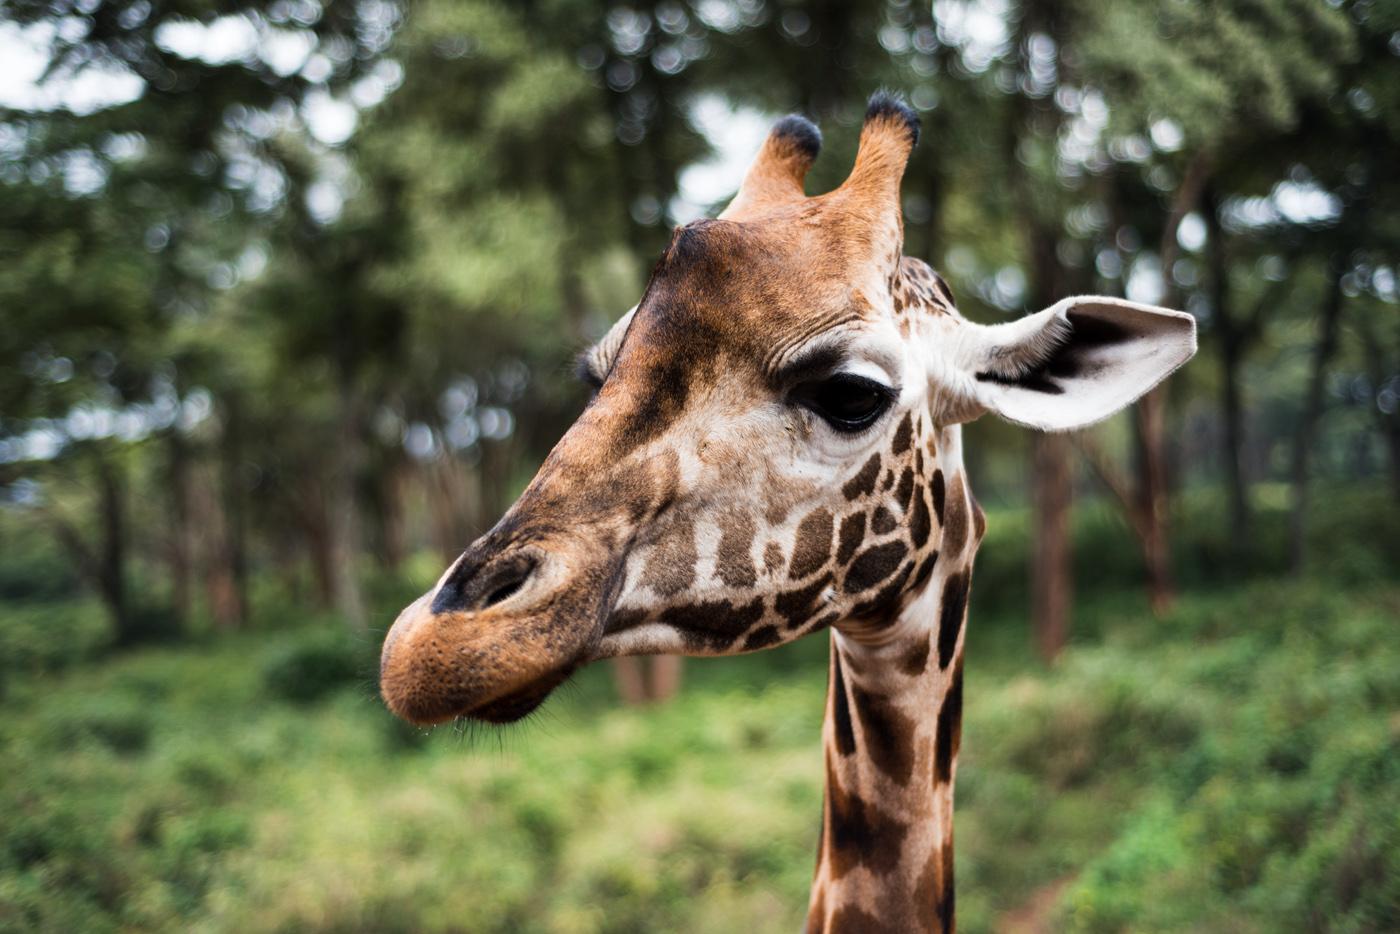 The Giraffe Centre #1